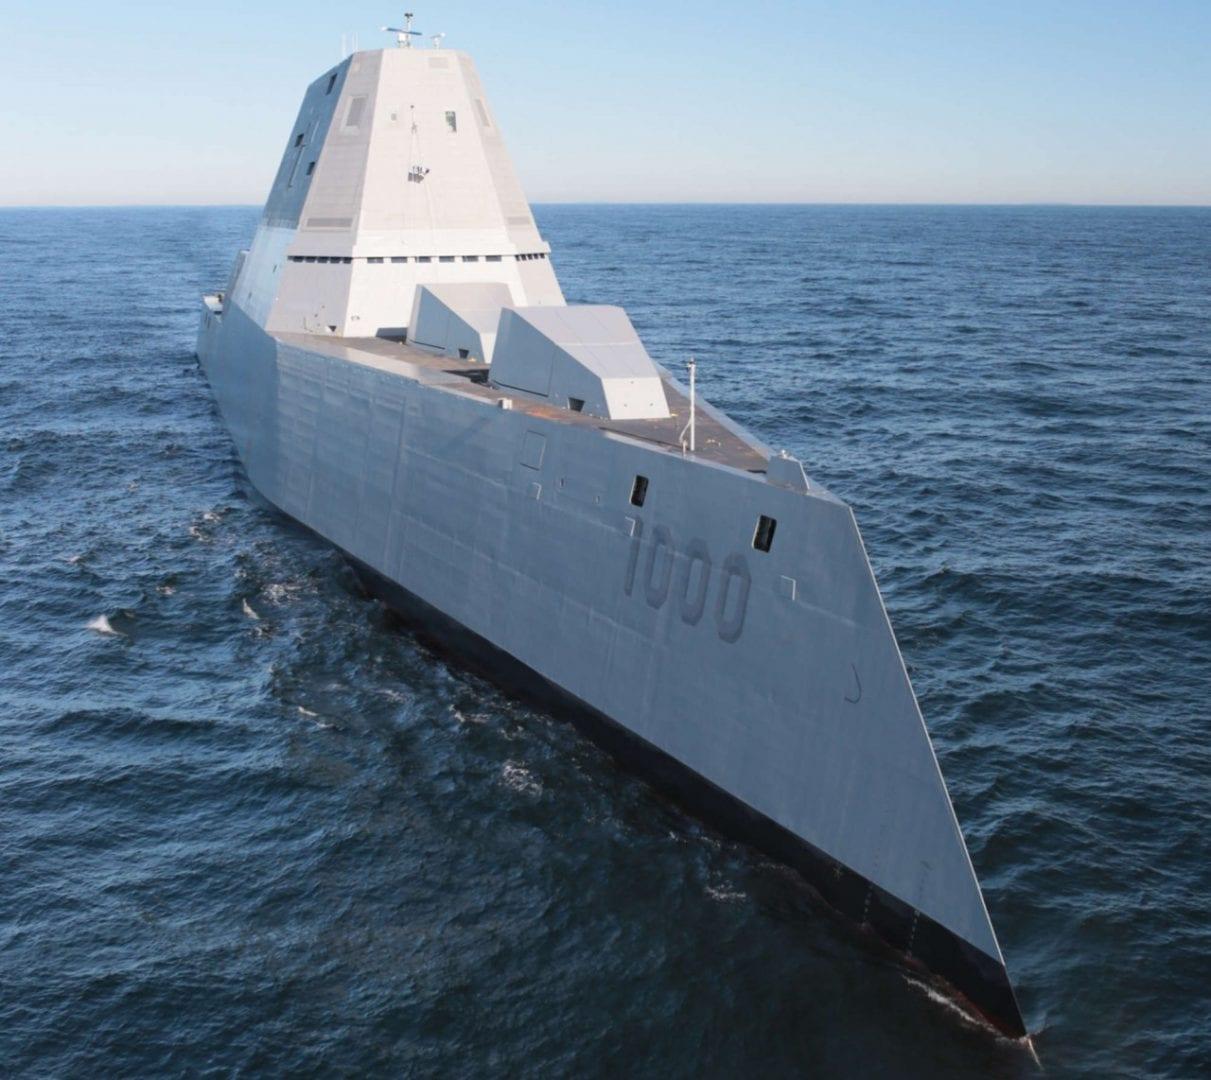 USS_Zumwalt_(DDG-1000)_2